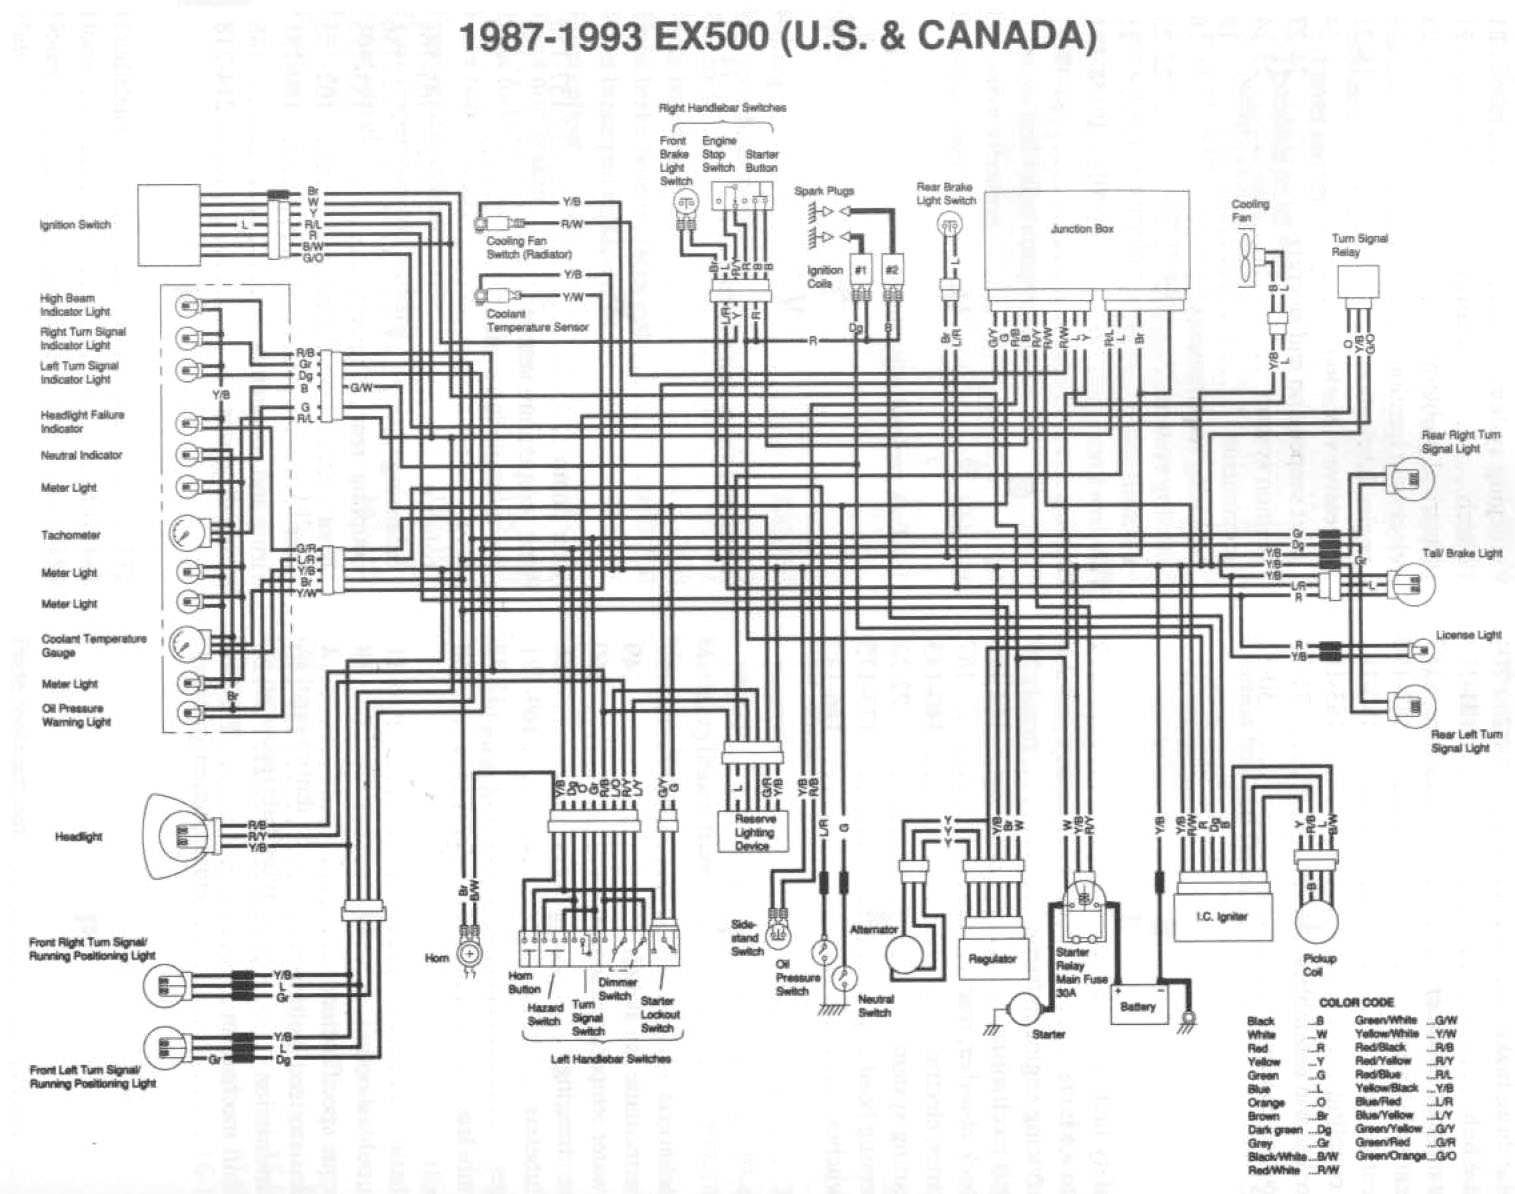 C59A040 Scotts S1642 Wiring Diagram | Wiring Resources on jayco trailer wiring, prowler trailer wiring, hi lo trailer wiring,